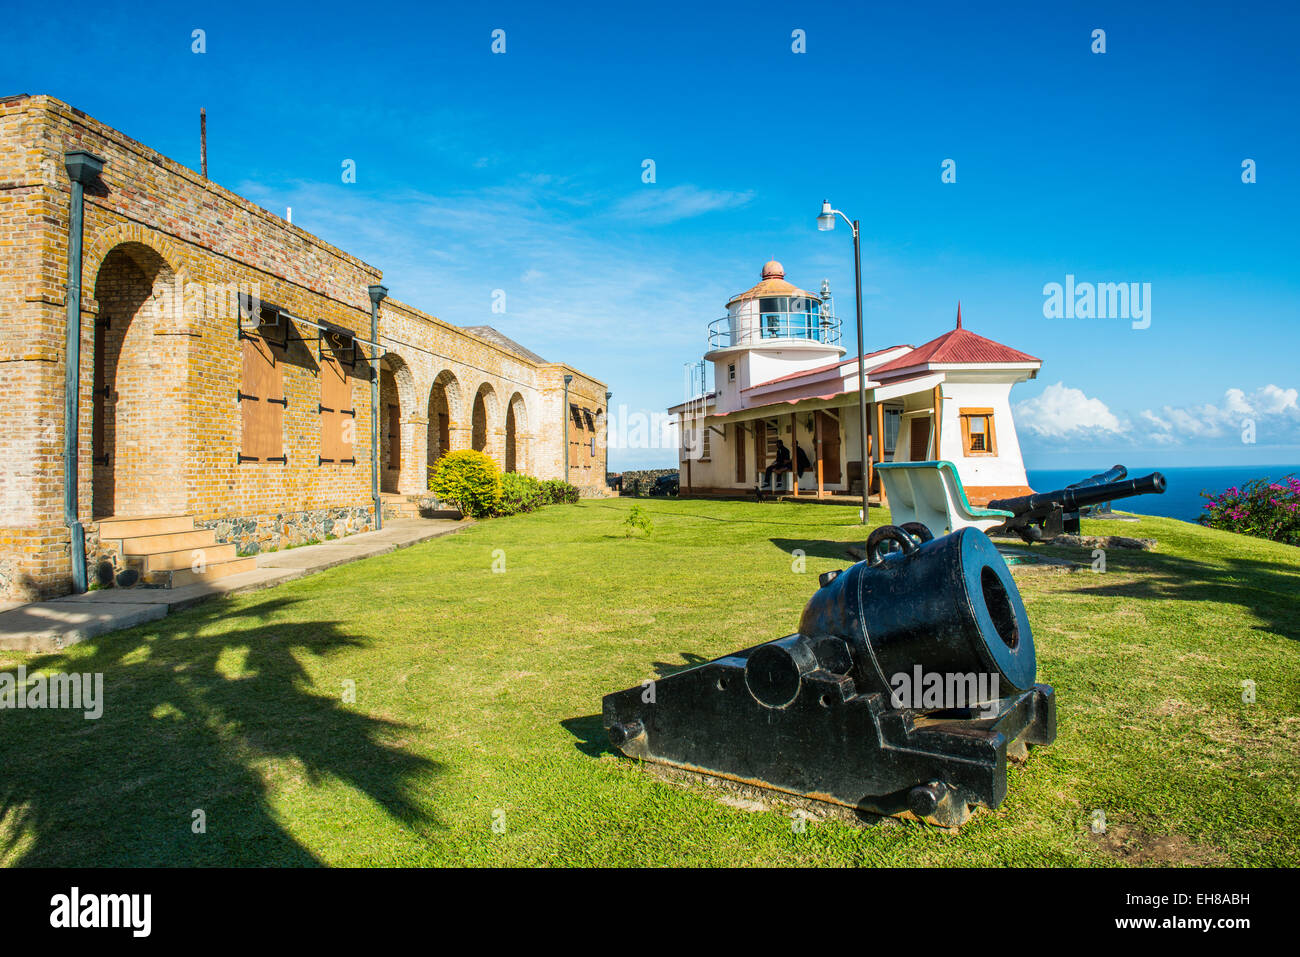 Fort King George, Scarborough, Tobago, Trinidad and Tobago, West Indies, Caribbean, Central America - Stock Image